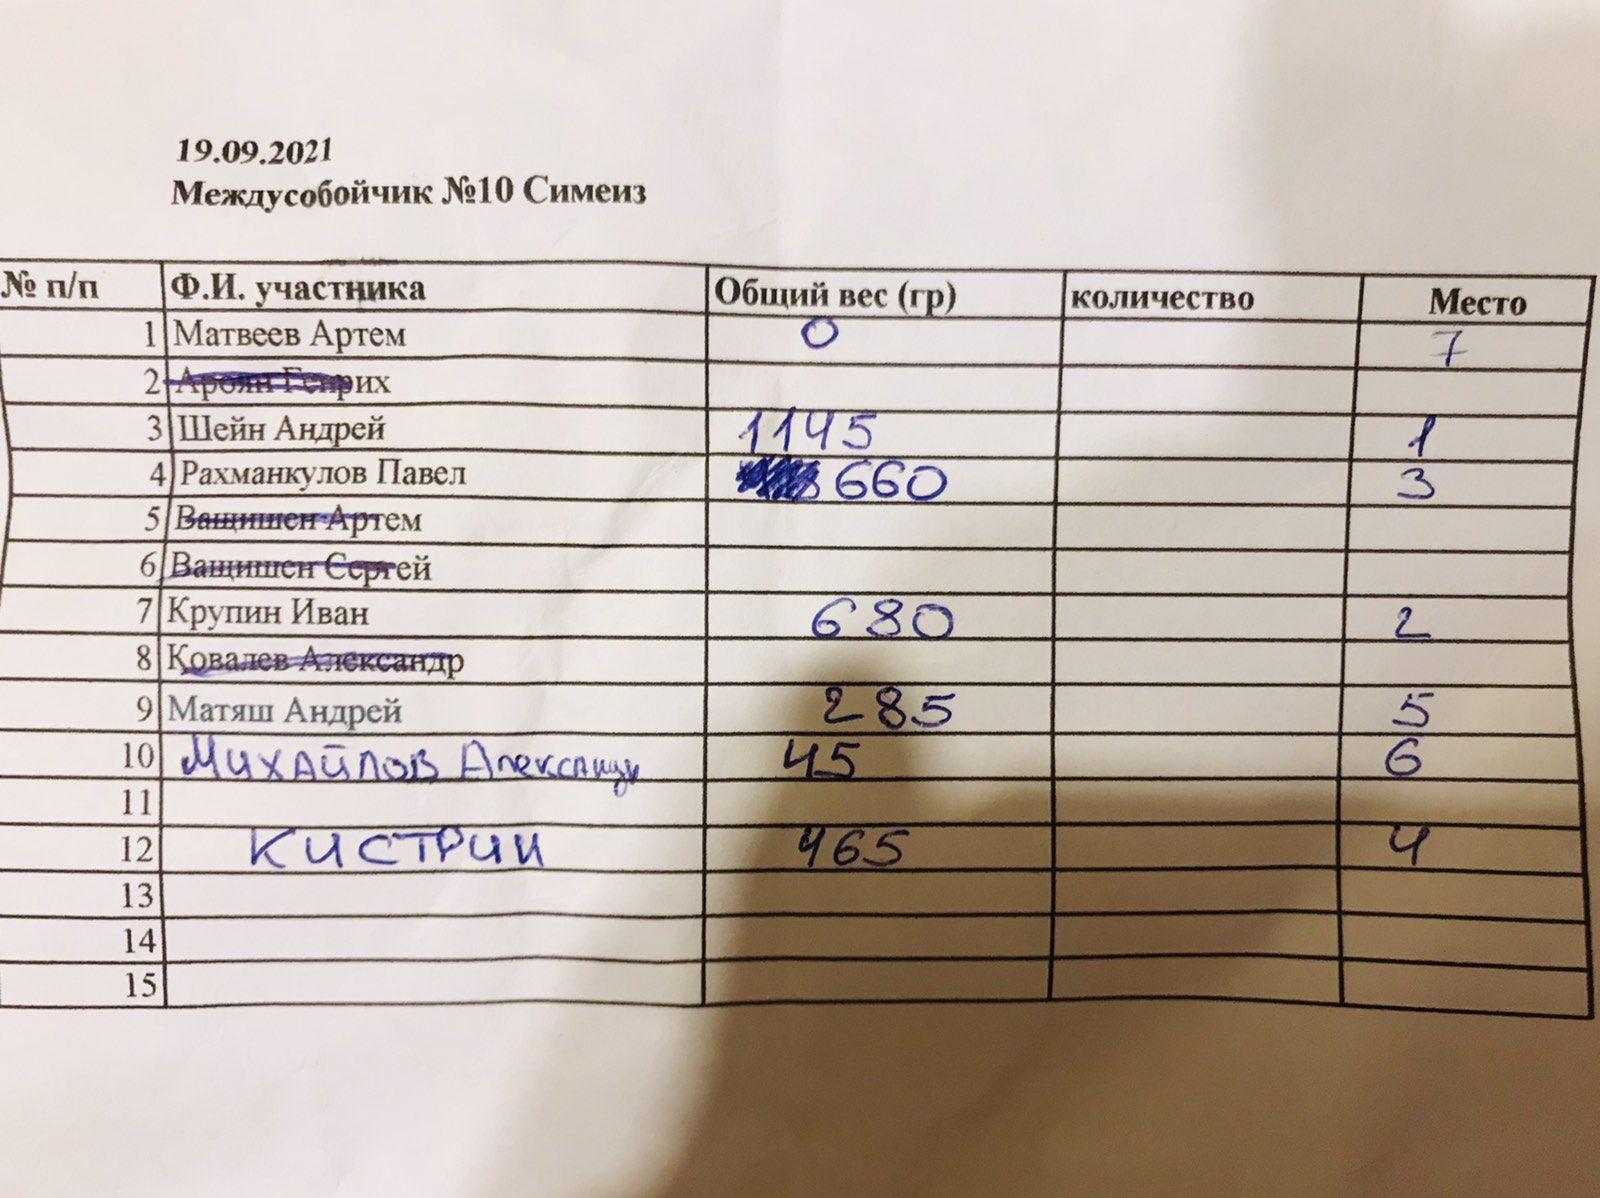 Междусобойчик ЯРК 2021 №10. 19.09.2021.Кастрополь(скорпена)